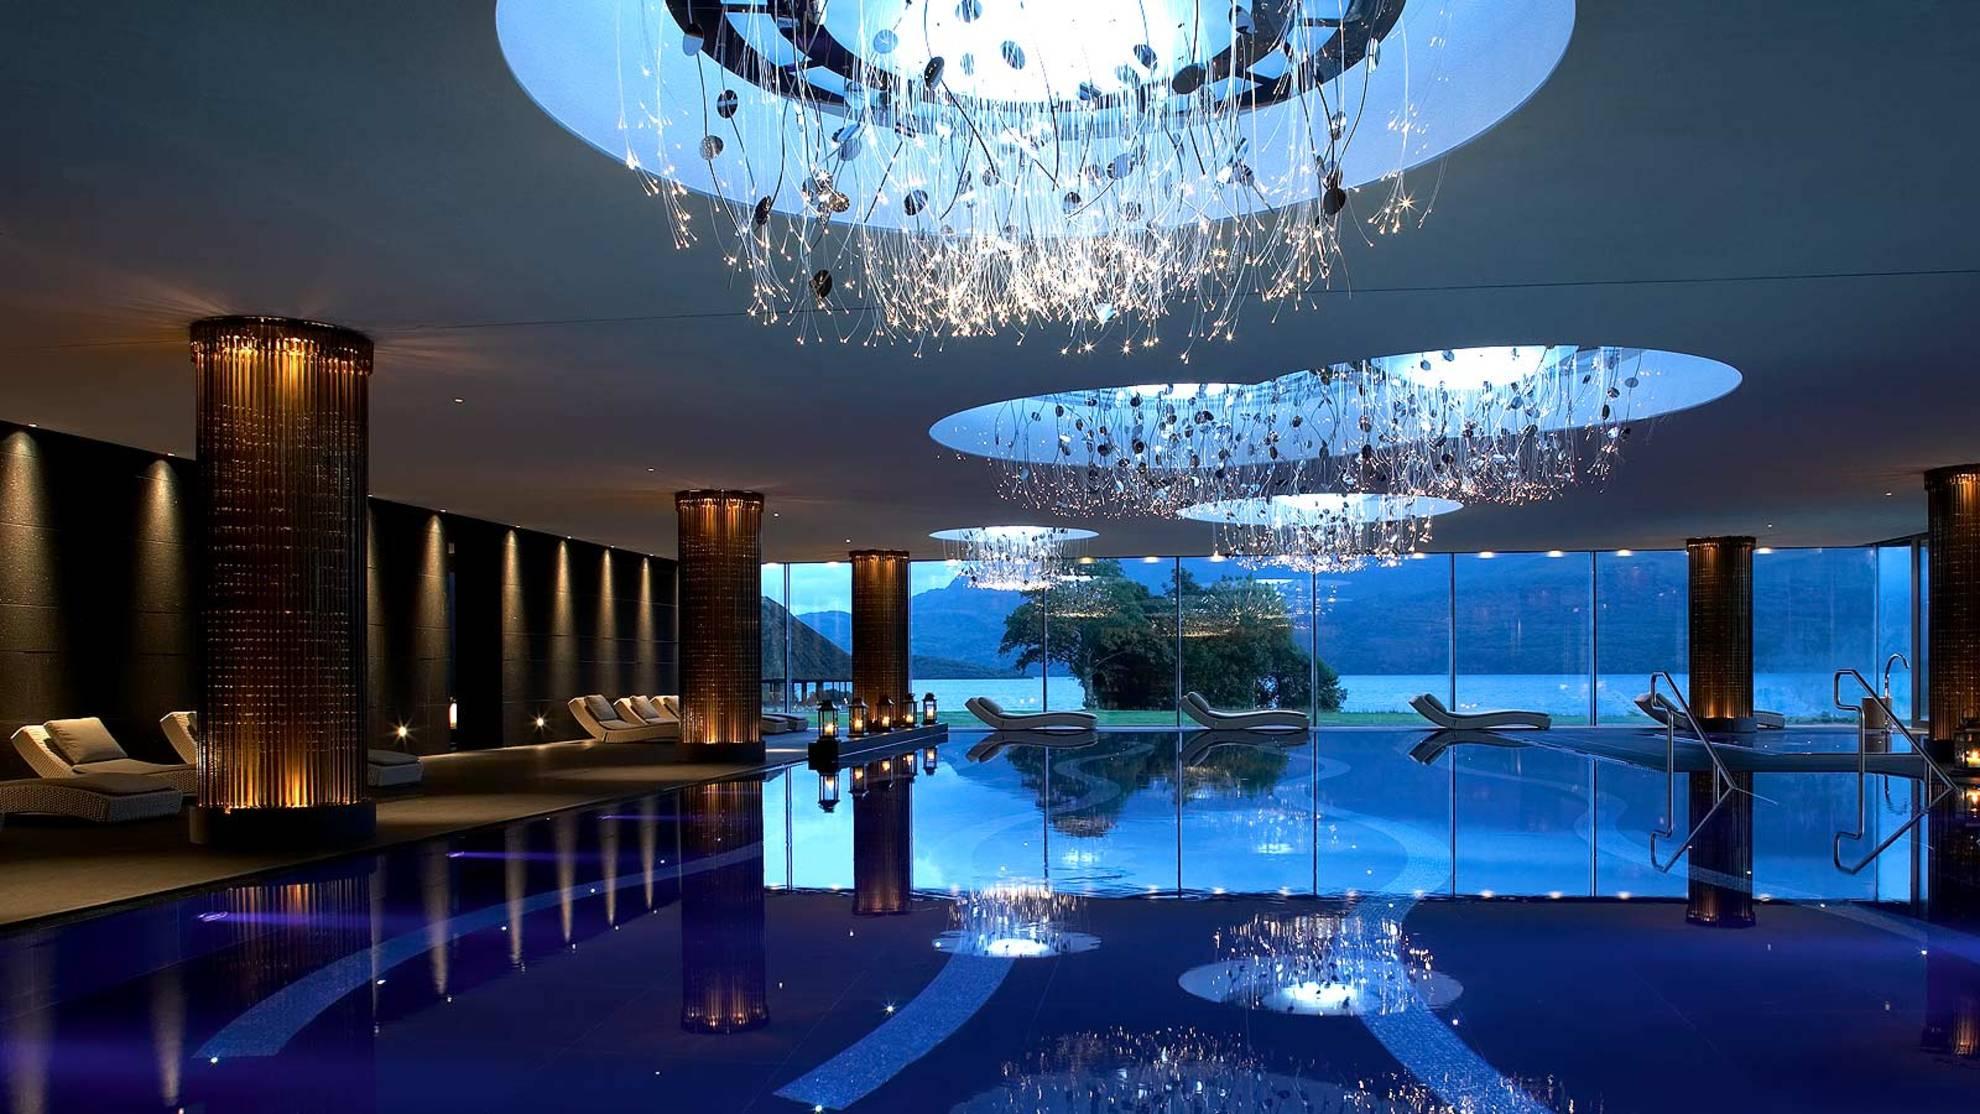 The Spa at the Europe Hotel,  Killarney